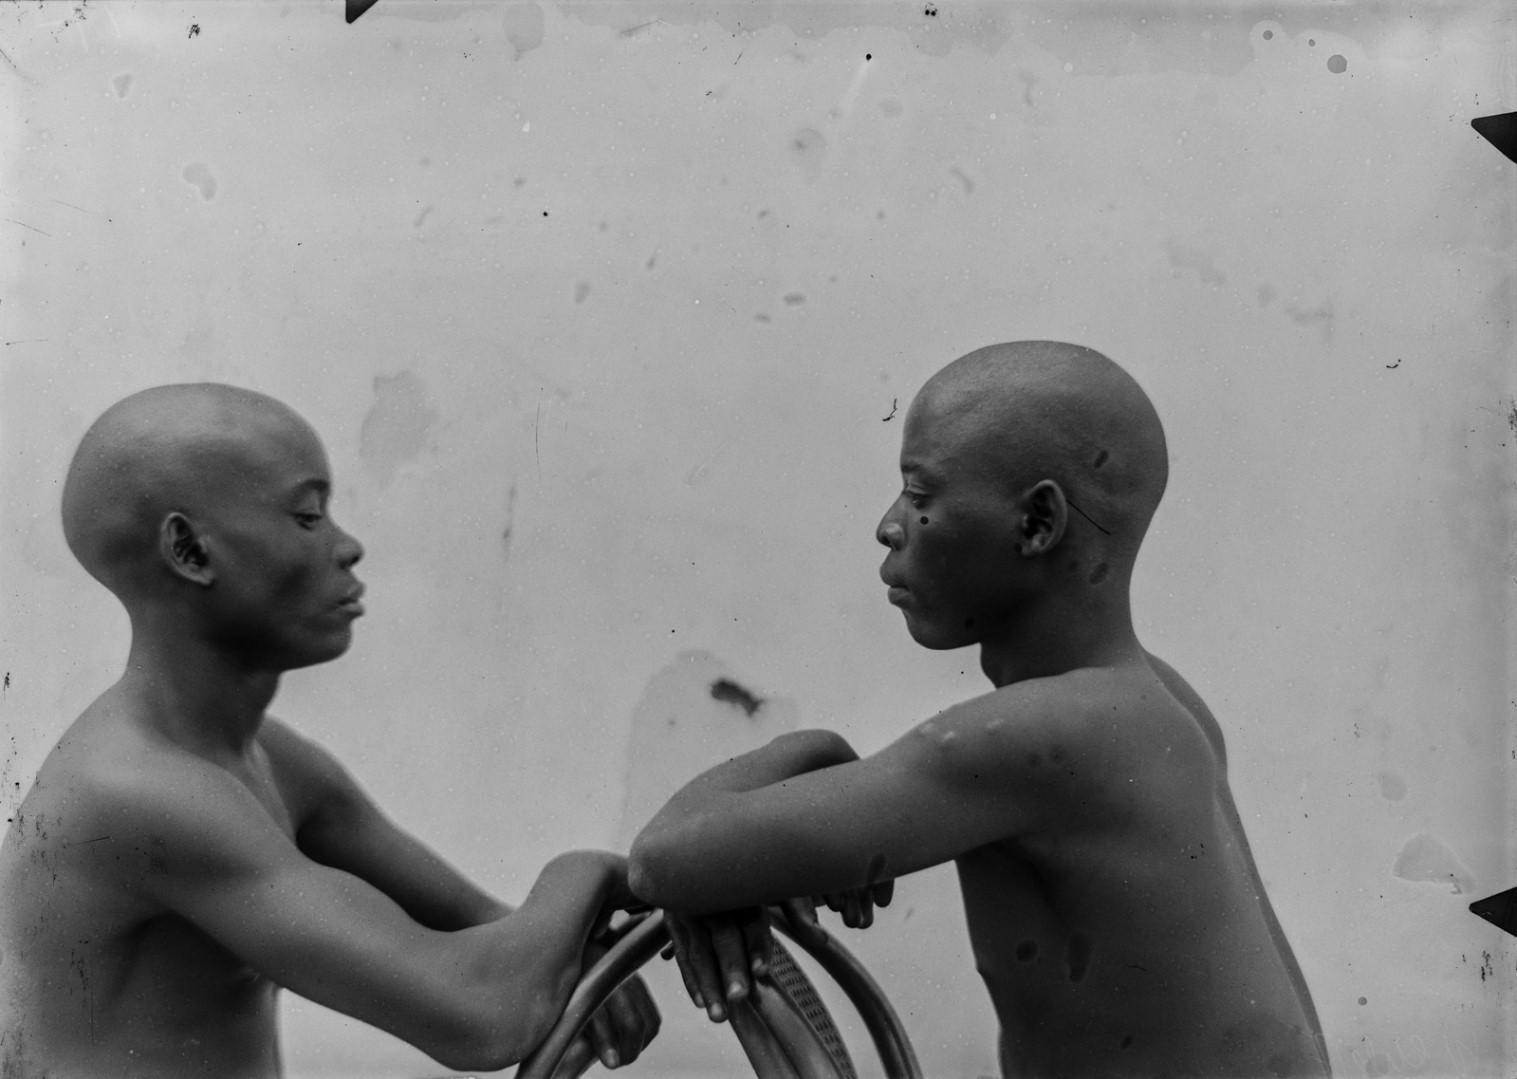 87. Портрет двух мужчин